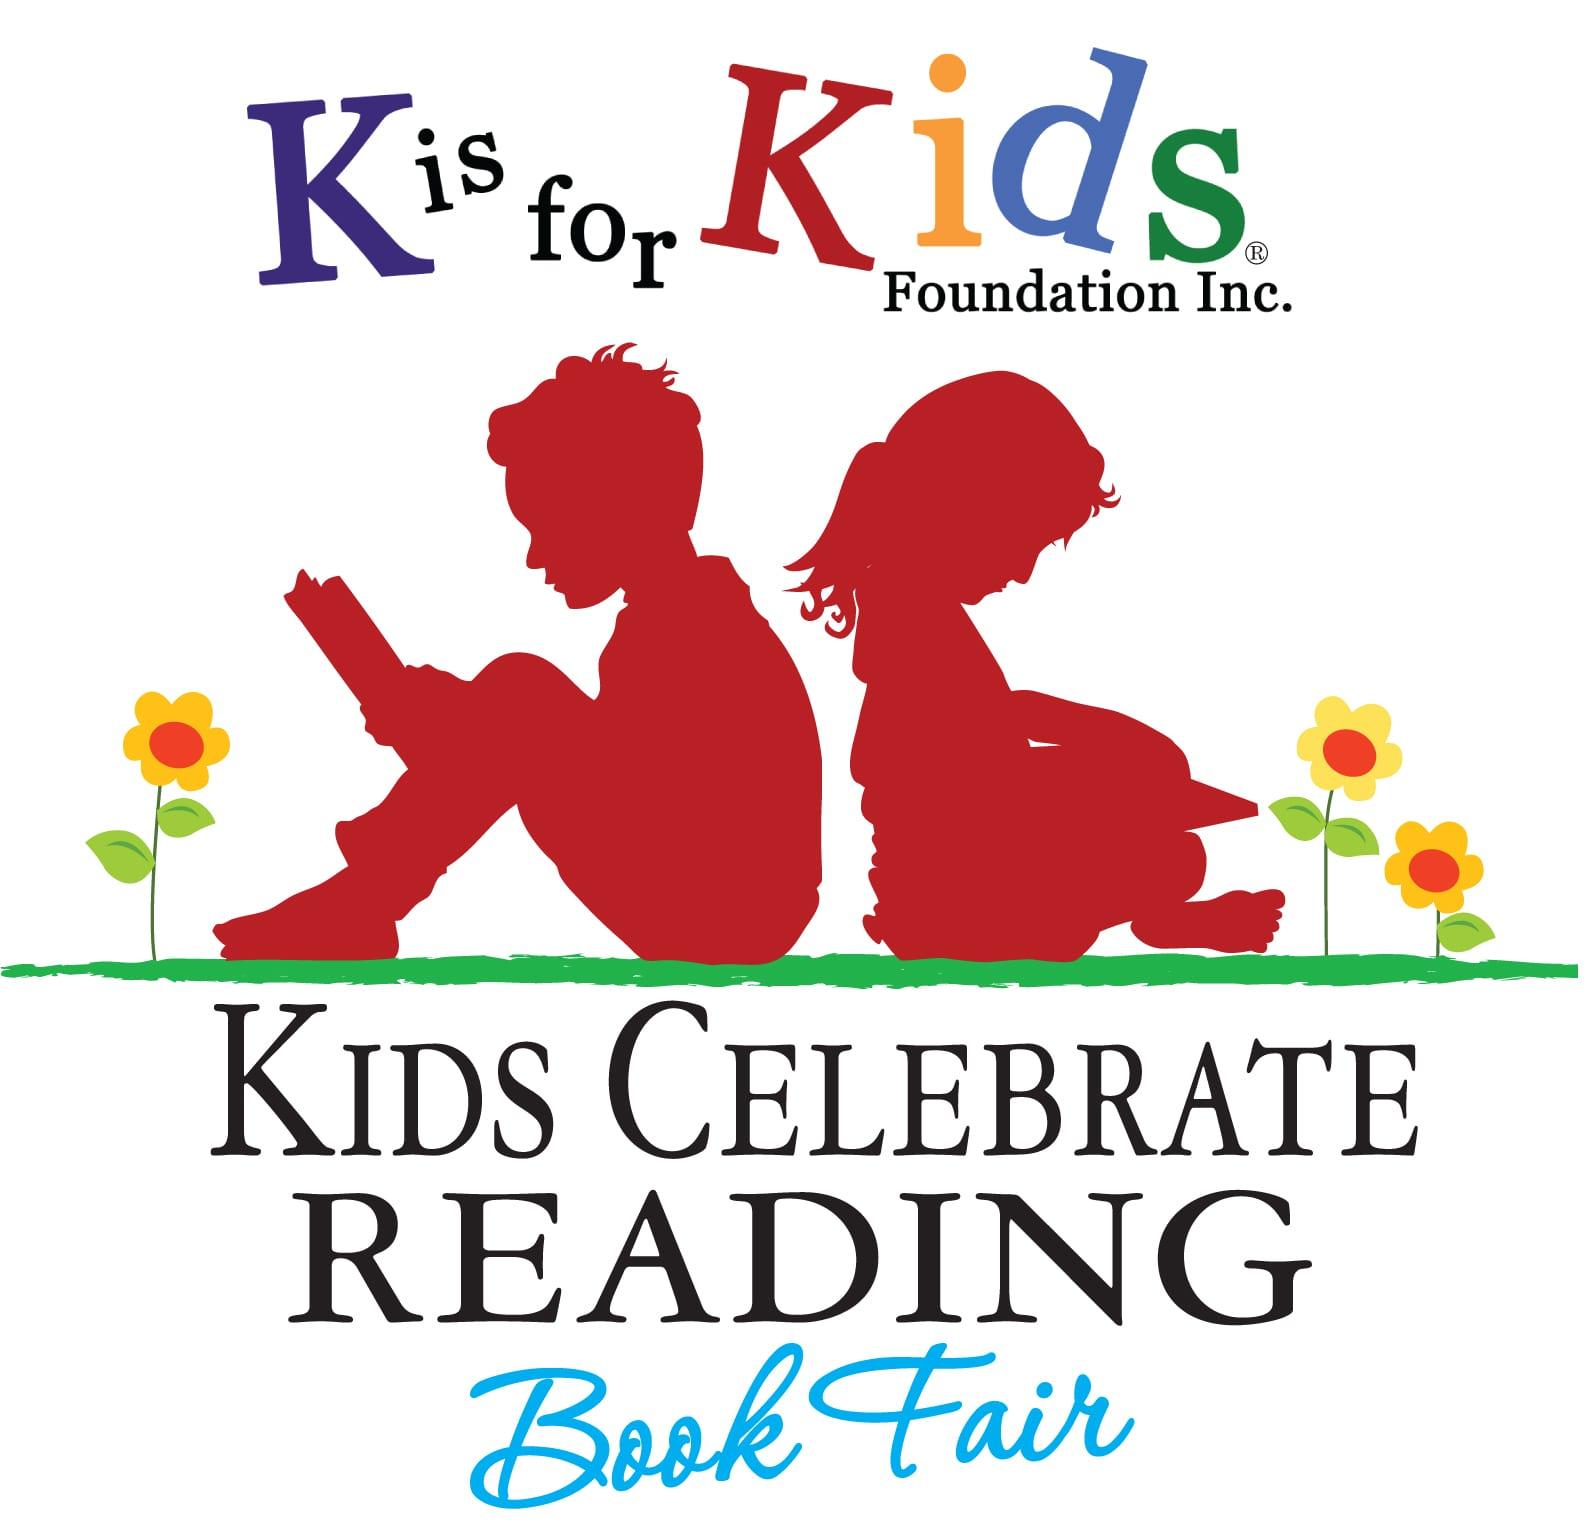 k is for kids fun raising season 2011 12 k is for kids foundation